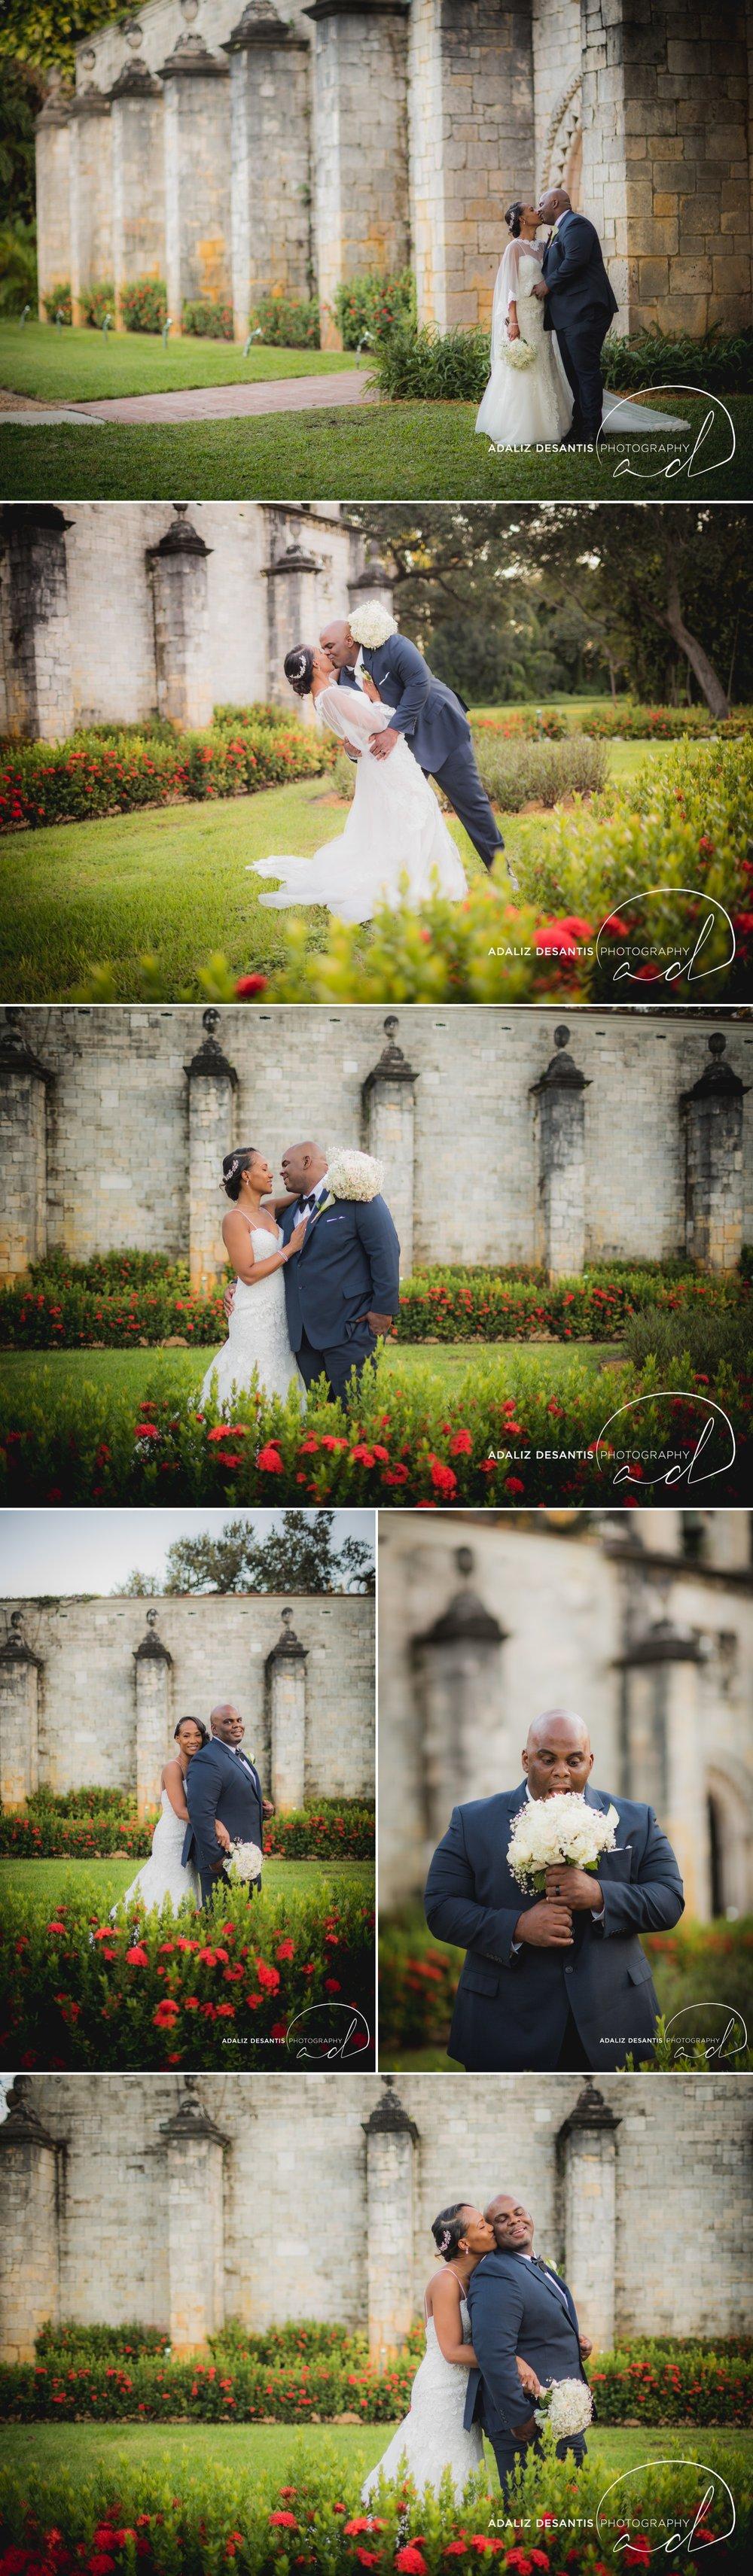 Katia gary ancient spanish monestary christian wedding garden backyard destination wedding plantation acres fort lauderdale miami florida 23.jpg